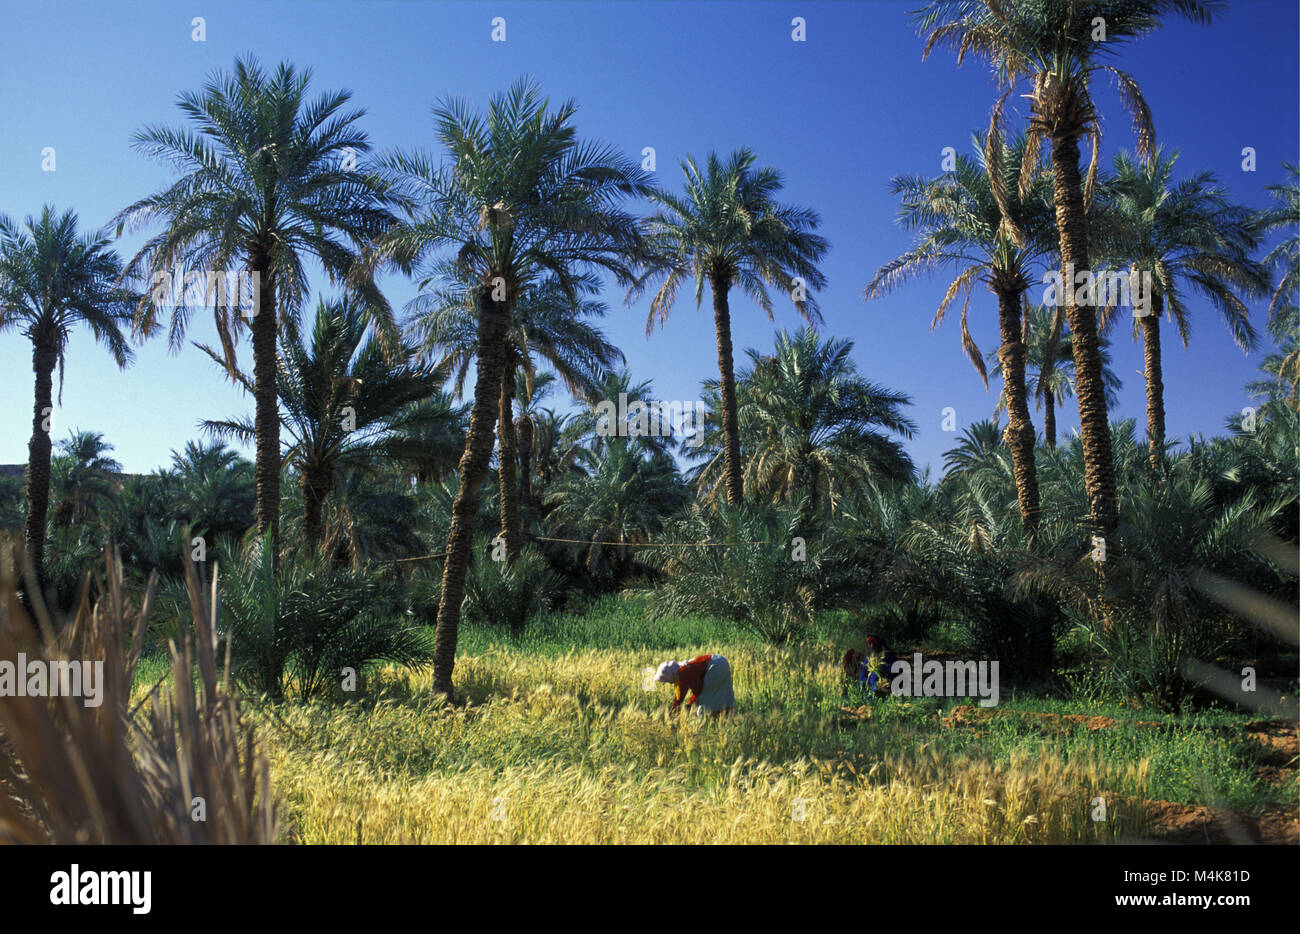 Algeria. Timimoun. Western Sand Sea. Grand Erg Occidental. Sahara desert. Oasis. Woman working in the gardens cutting - Stock Image